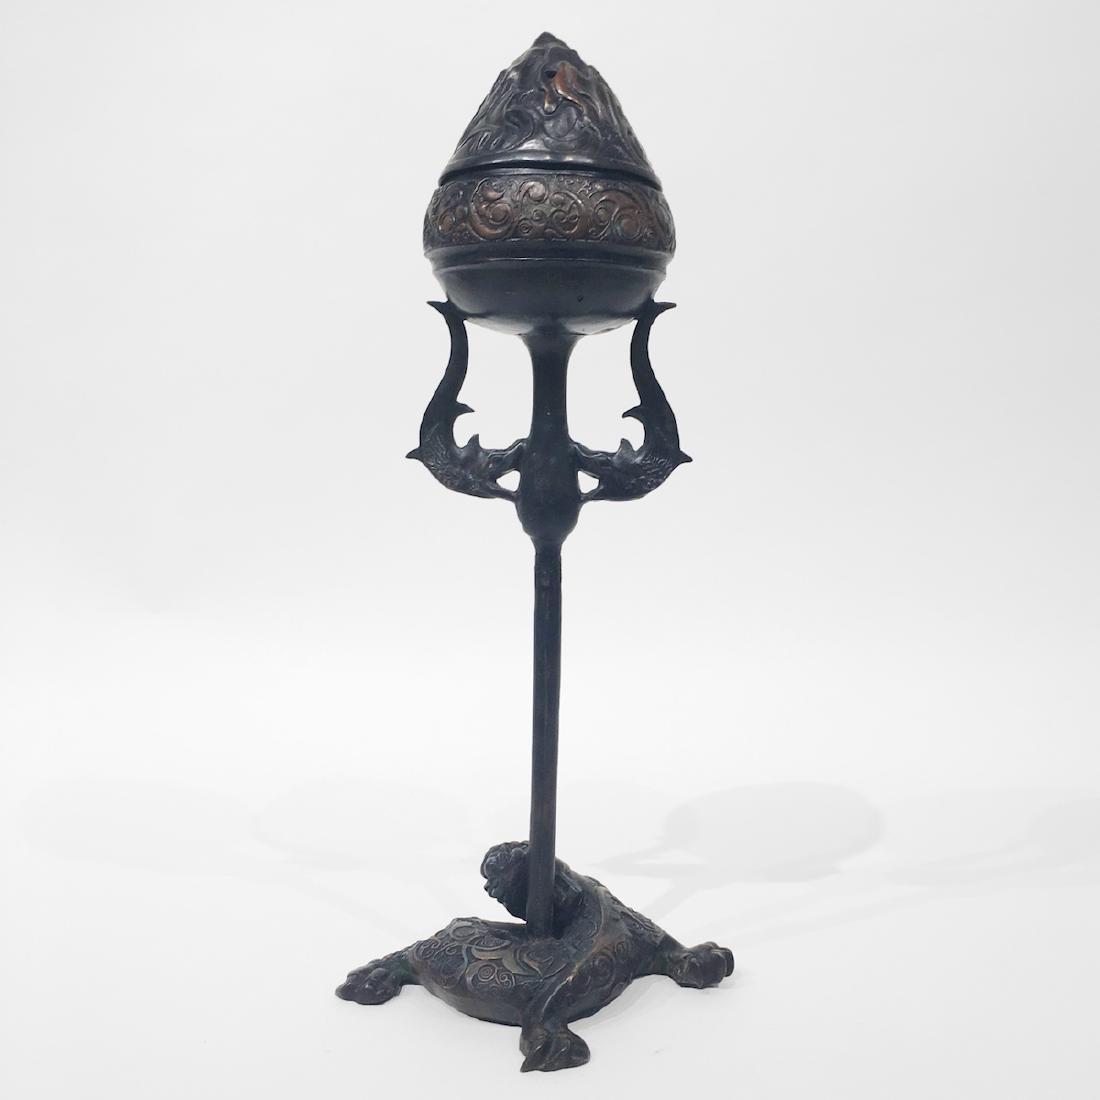 Chinese Bronze Incense Burner in Lotus Bud Form